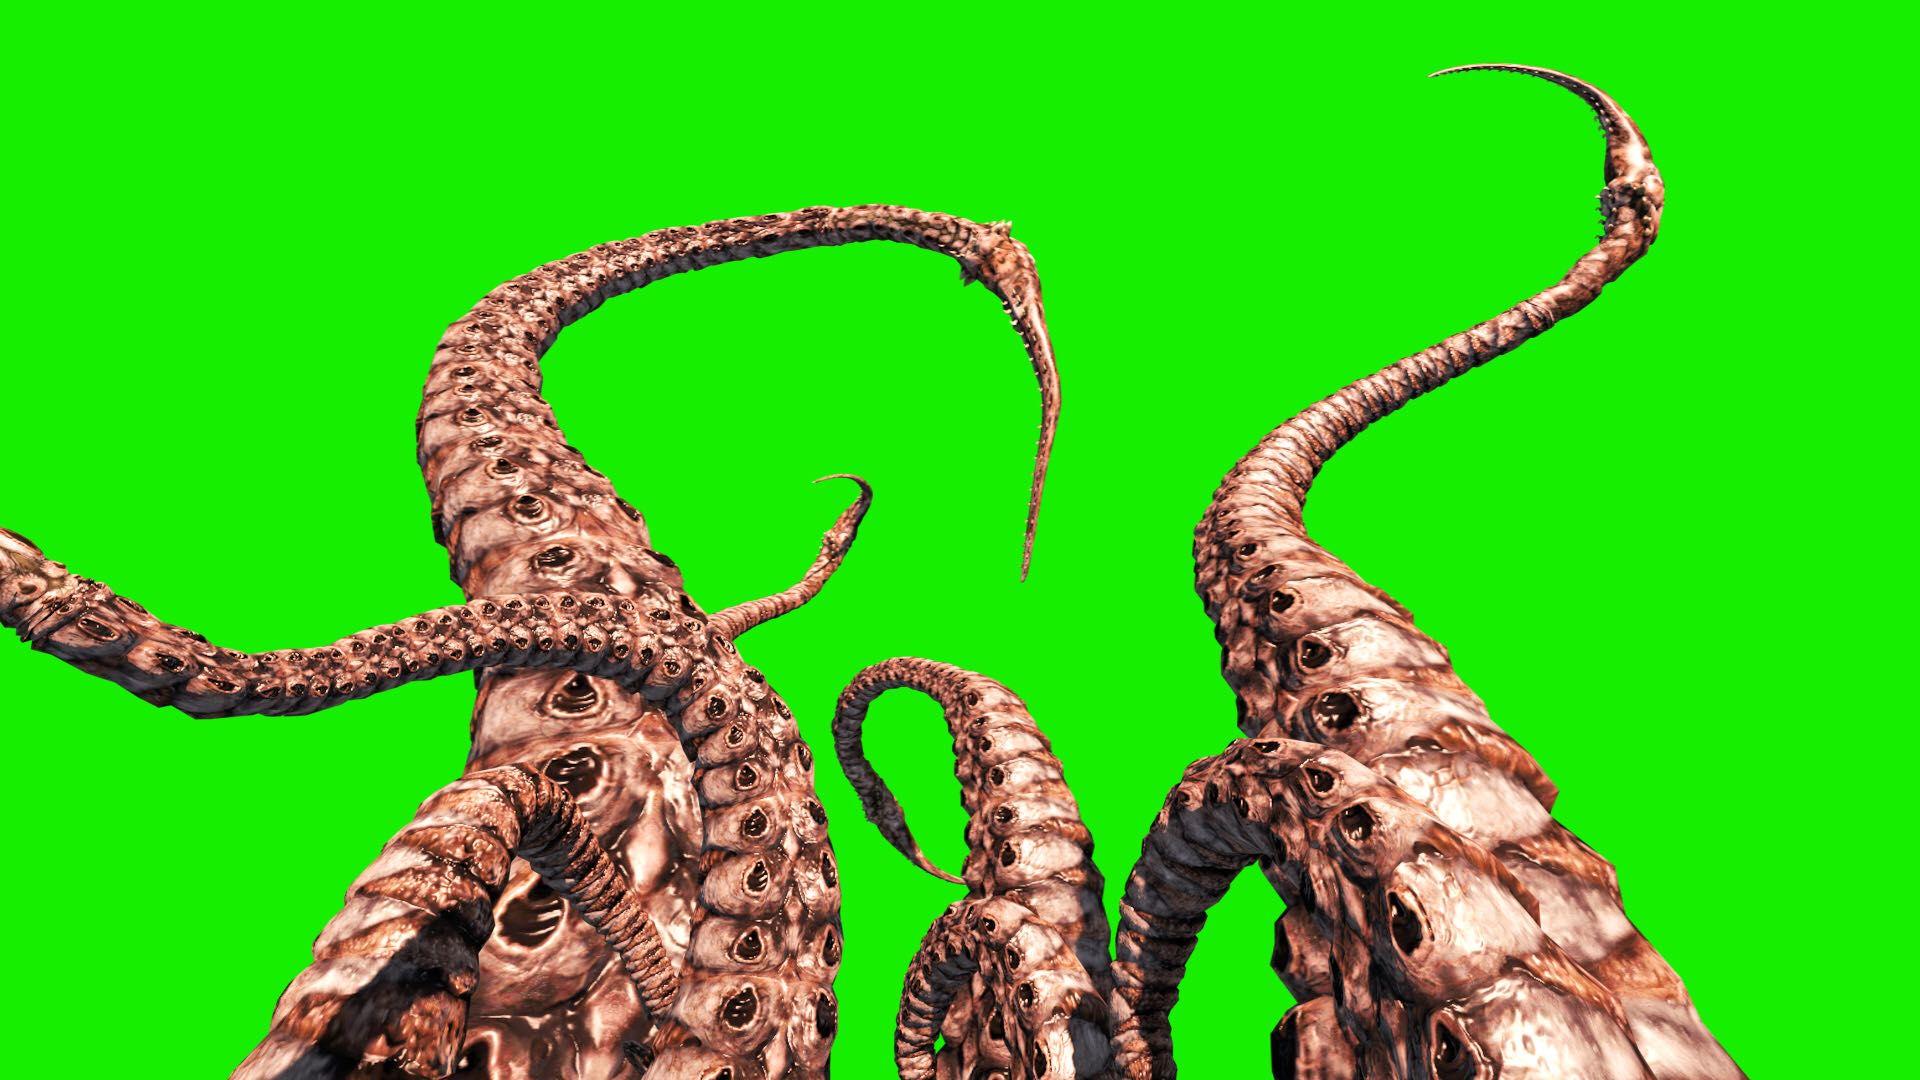 monster x readers - tentacle monster x fem! reader ?nsfw? - wattpad